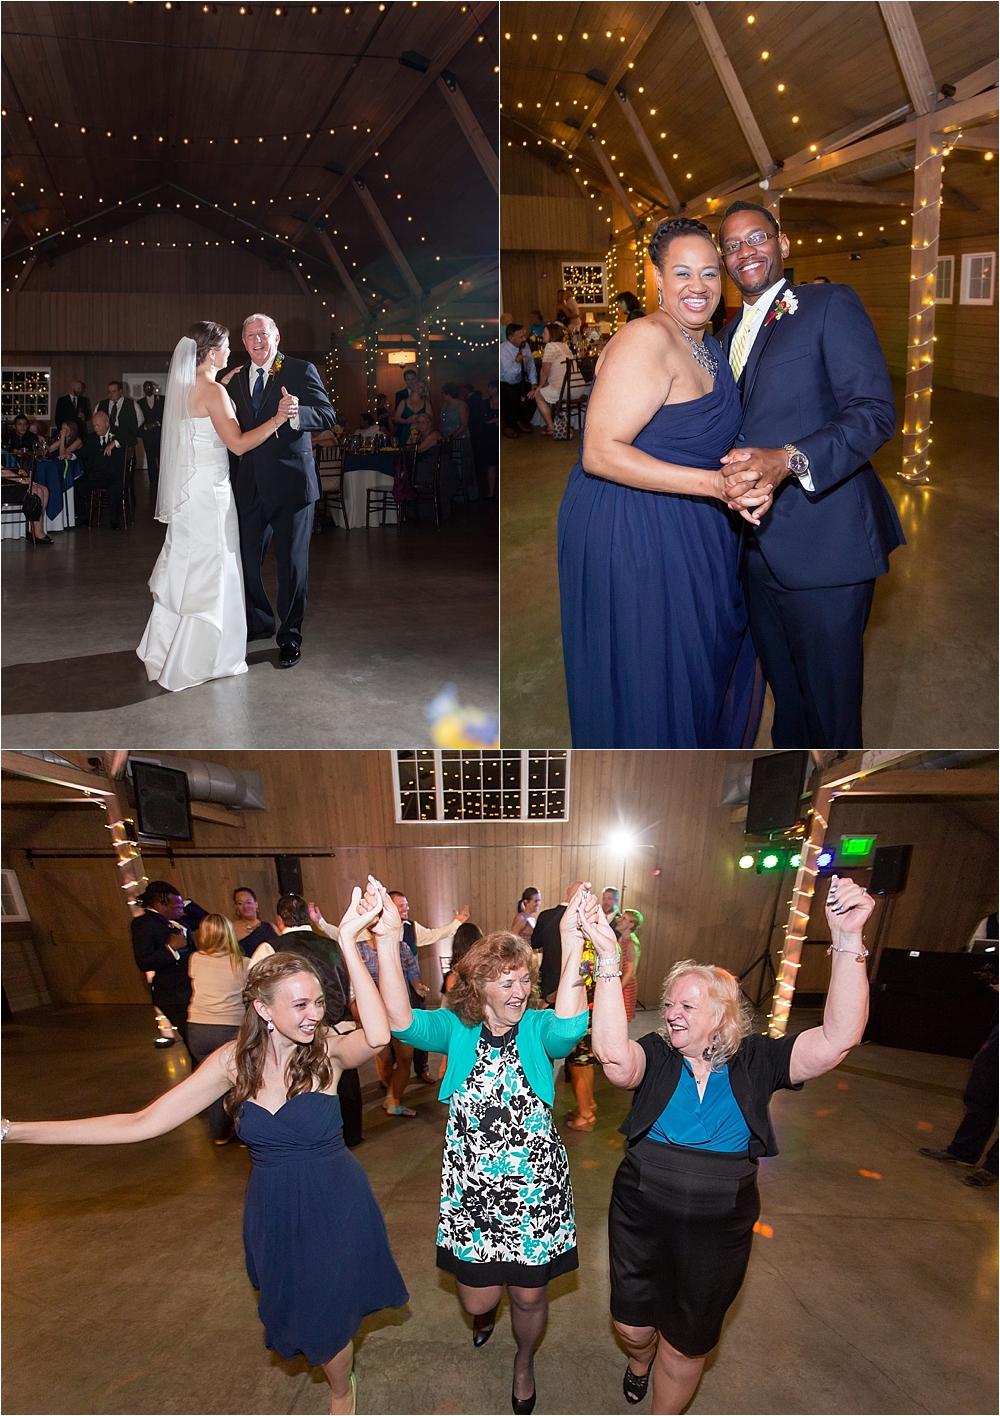 Christa and Brandons Raccoon Creek Wedding_0053.jpg